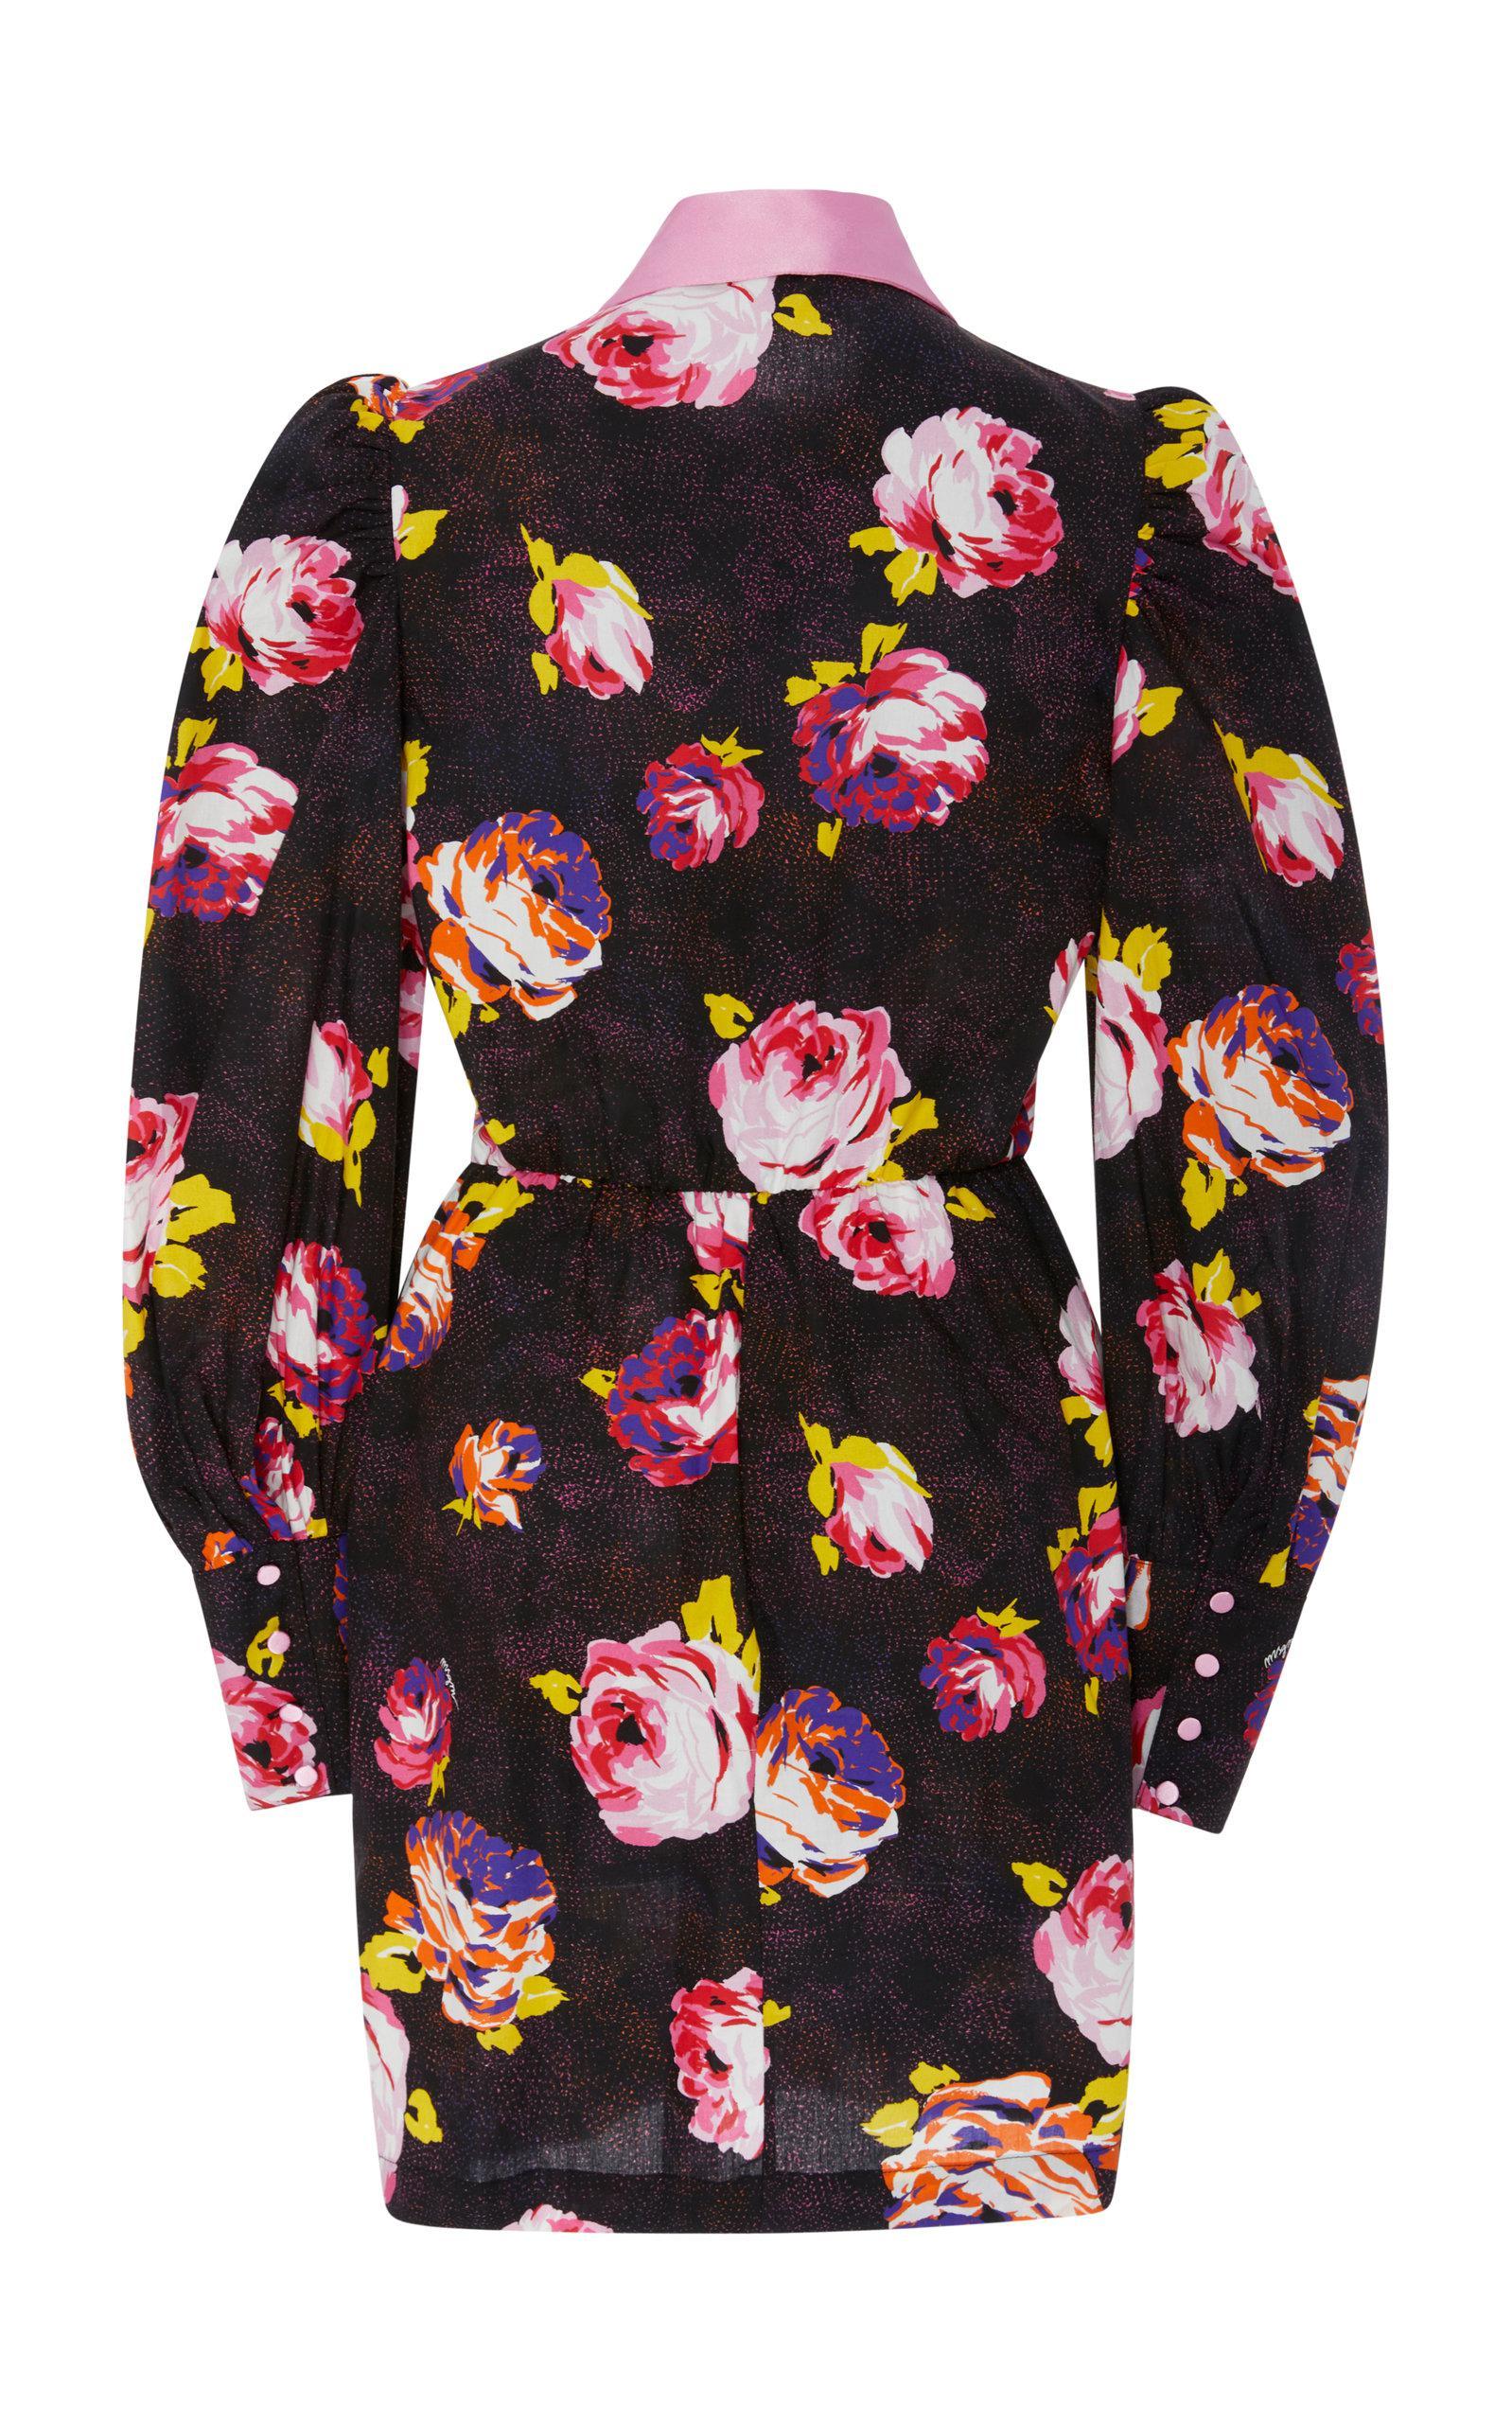 Floral Printed Button-up Mini Dress Msgm 3hIKjb7k